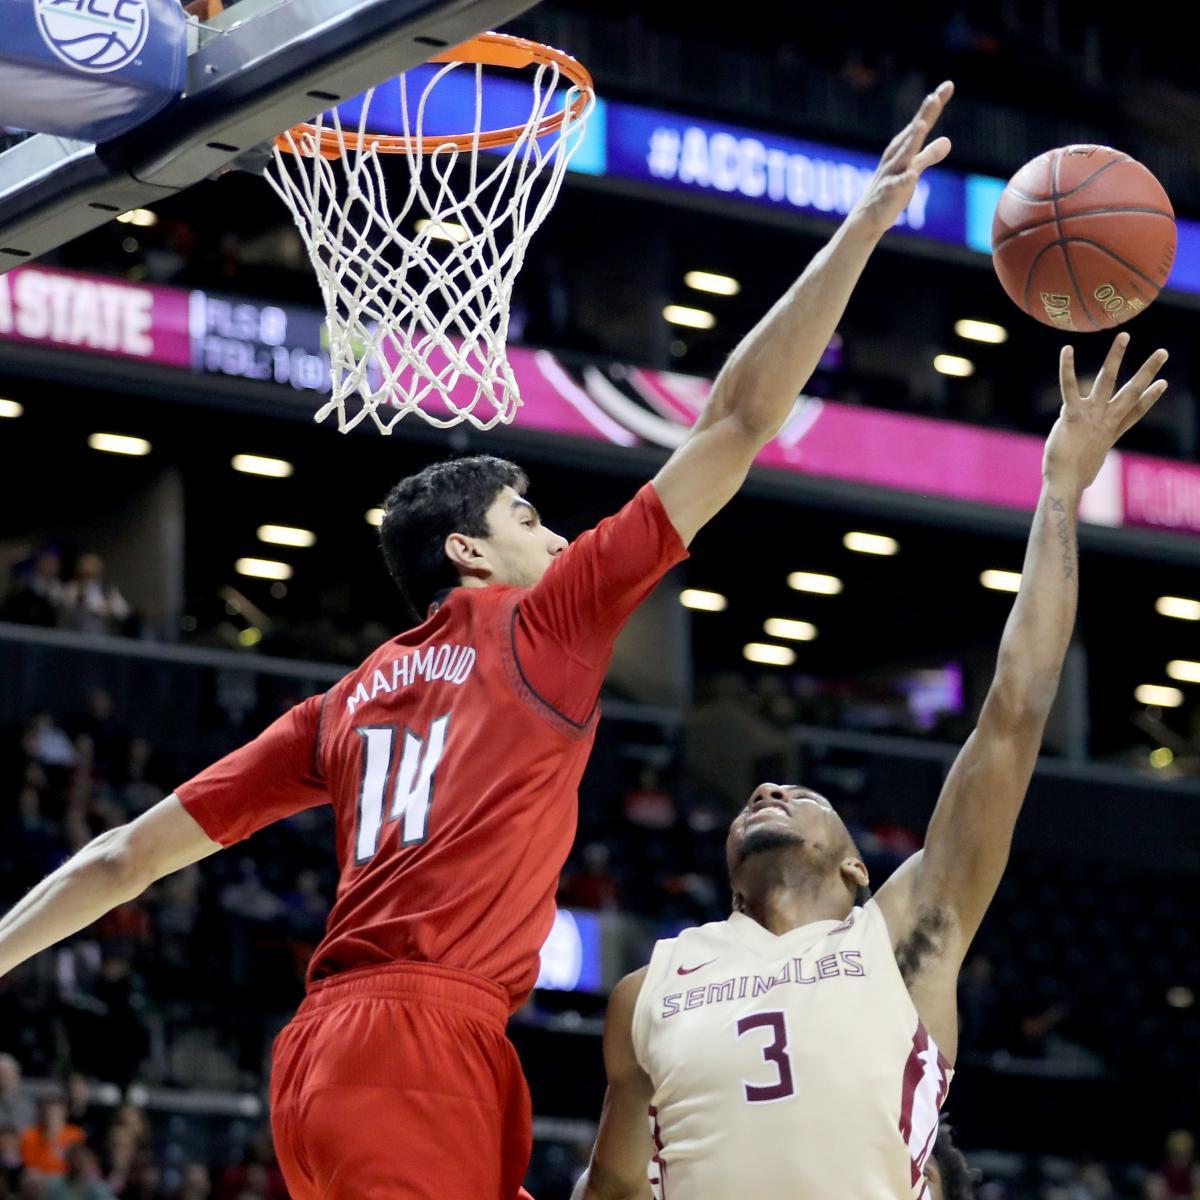 NCAA Tournament 2018: Selection Sunday Schedule, Latest Bracketology